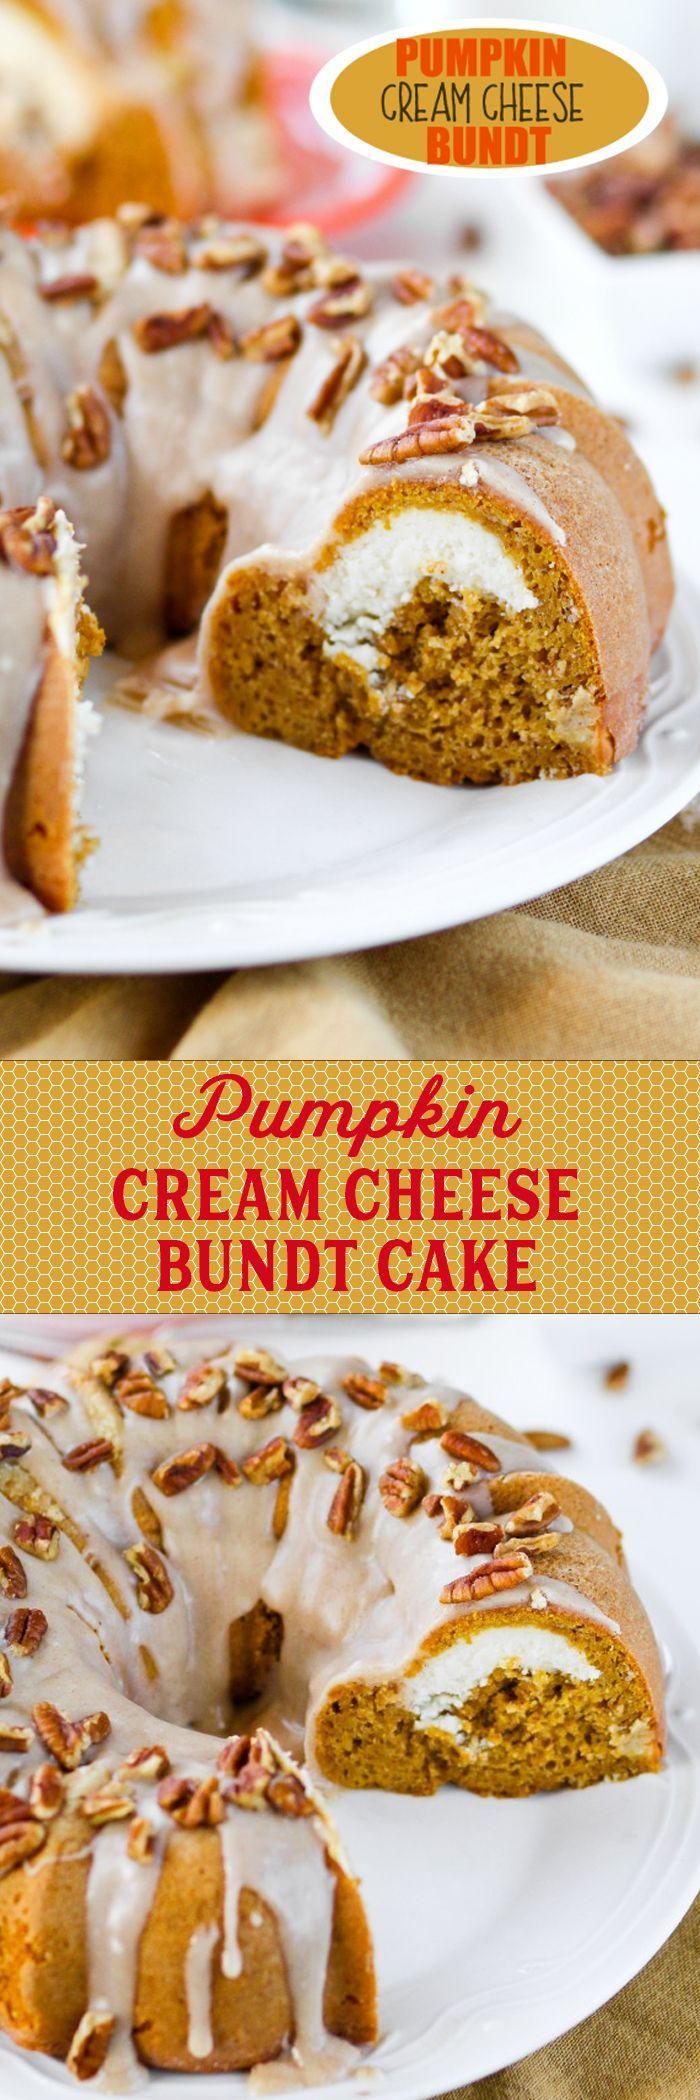 Pumpkin Cream Cheese Bundt -- Moist pumpkin bundt cake with a hidden cheesecake layer! Such a fun surprise to cut into.